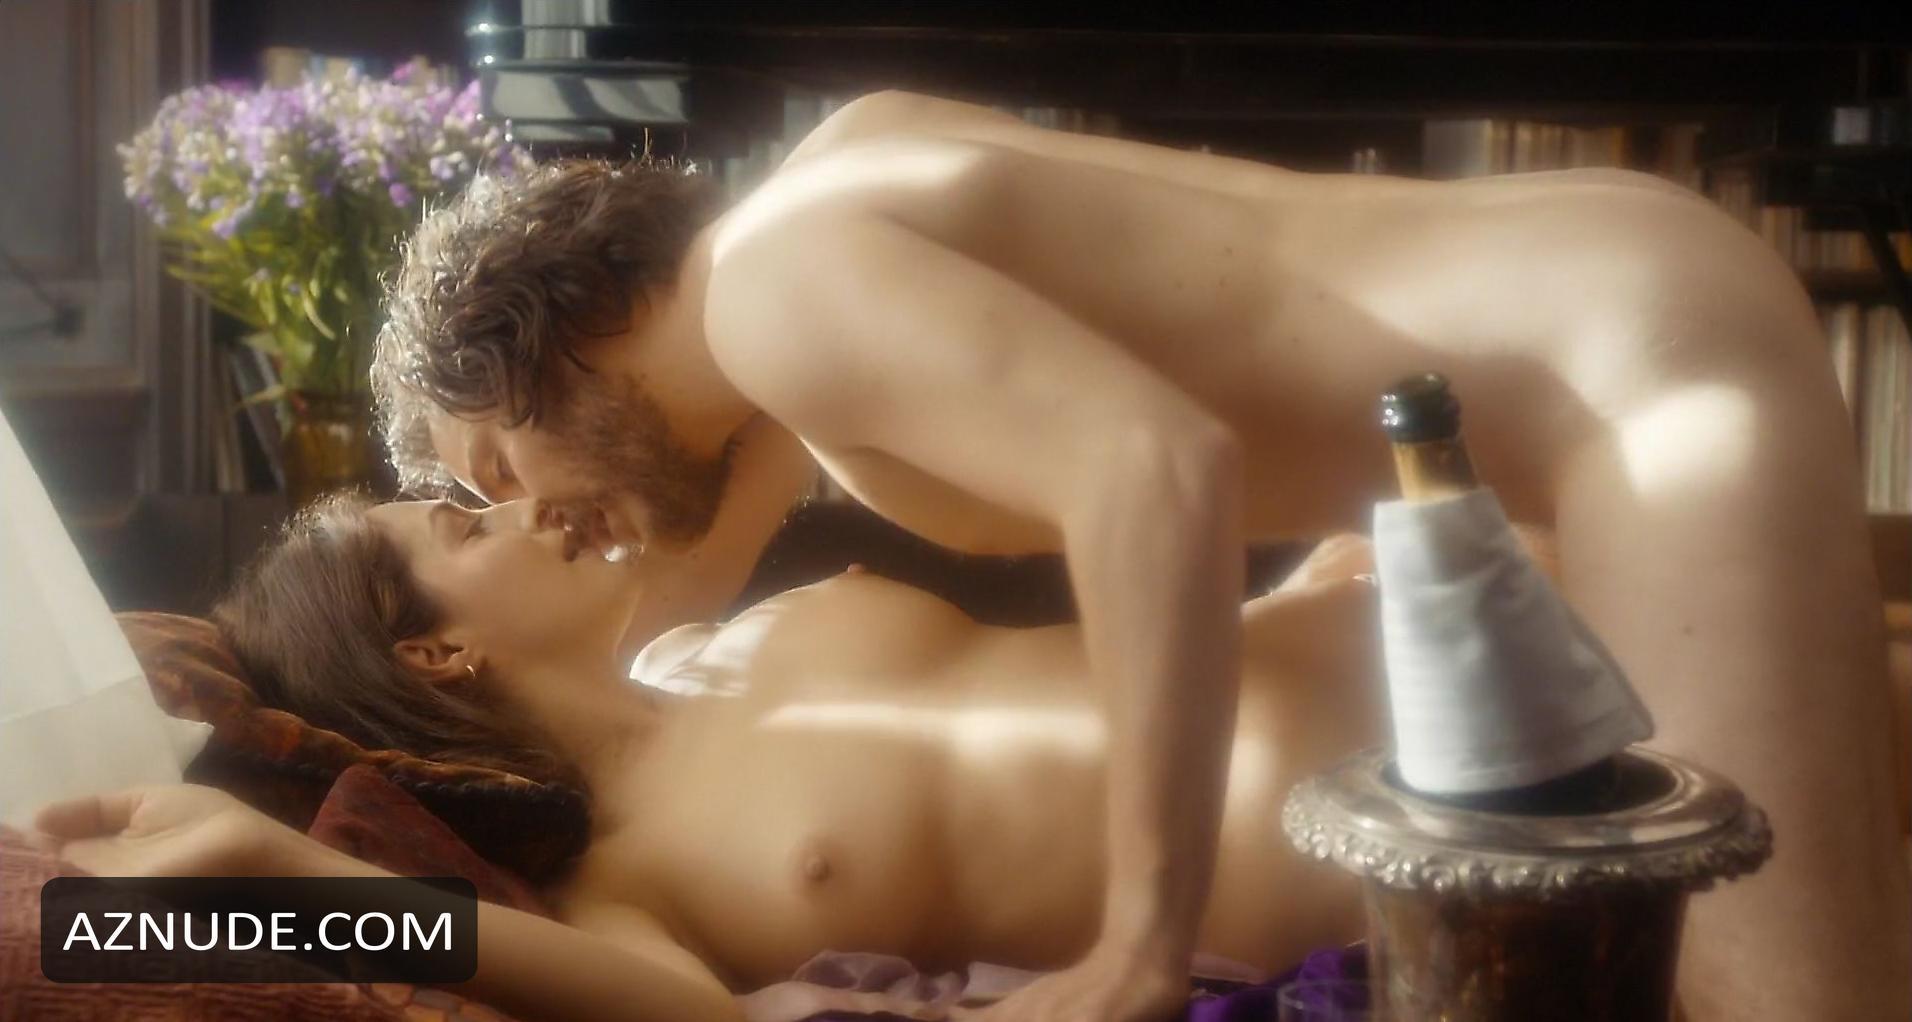 Nude Amira Casar naked (51 photo), Ass, Leaked, Selfie, legs 2020